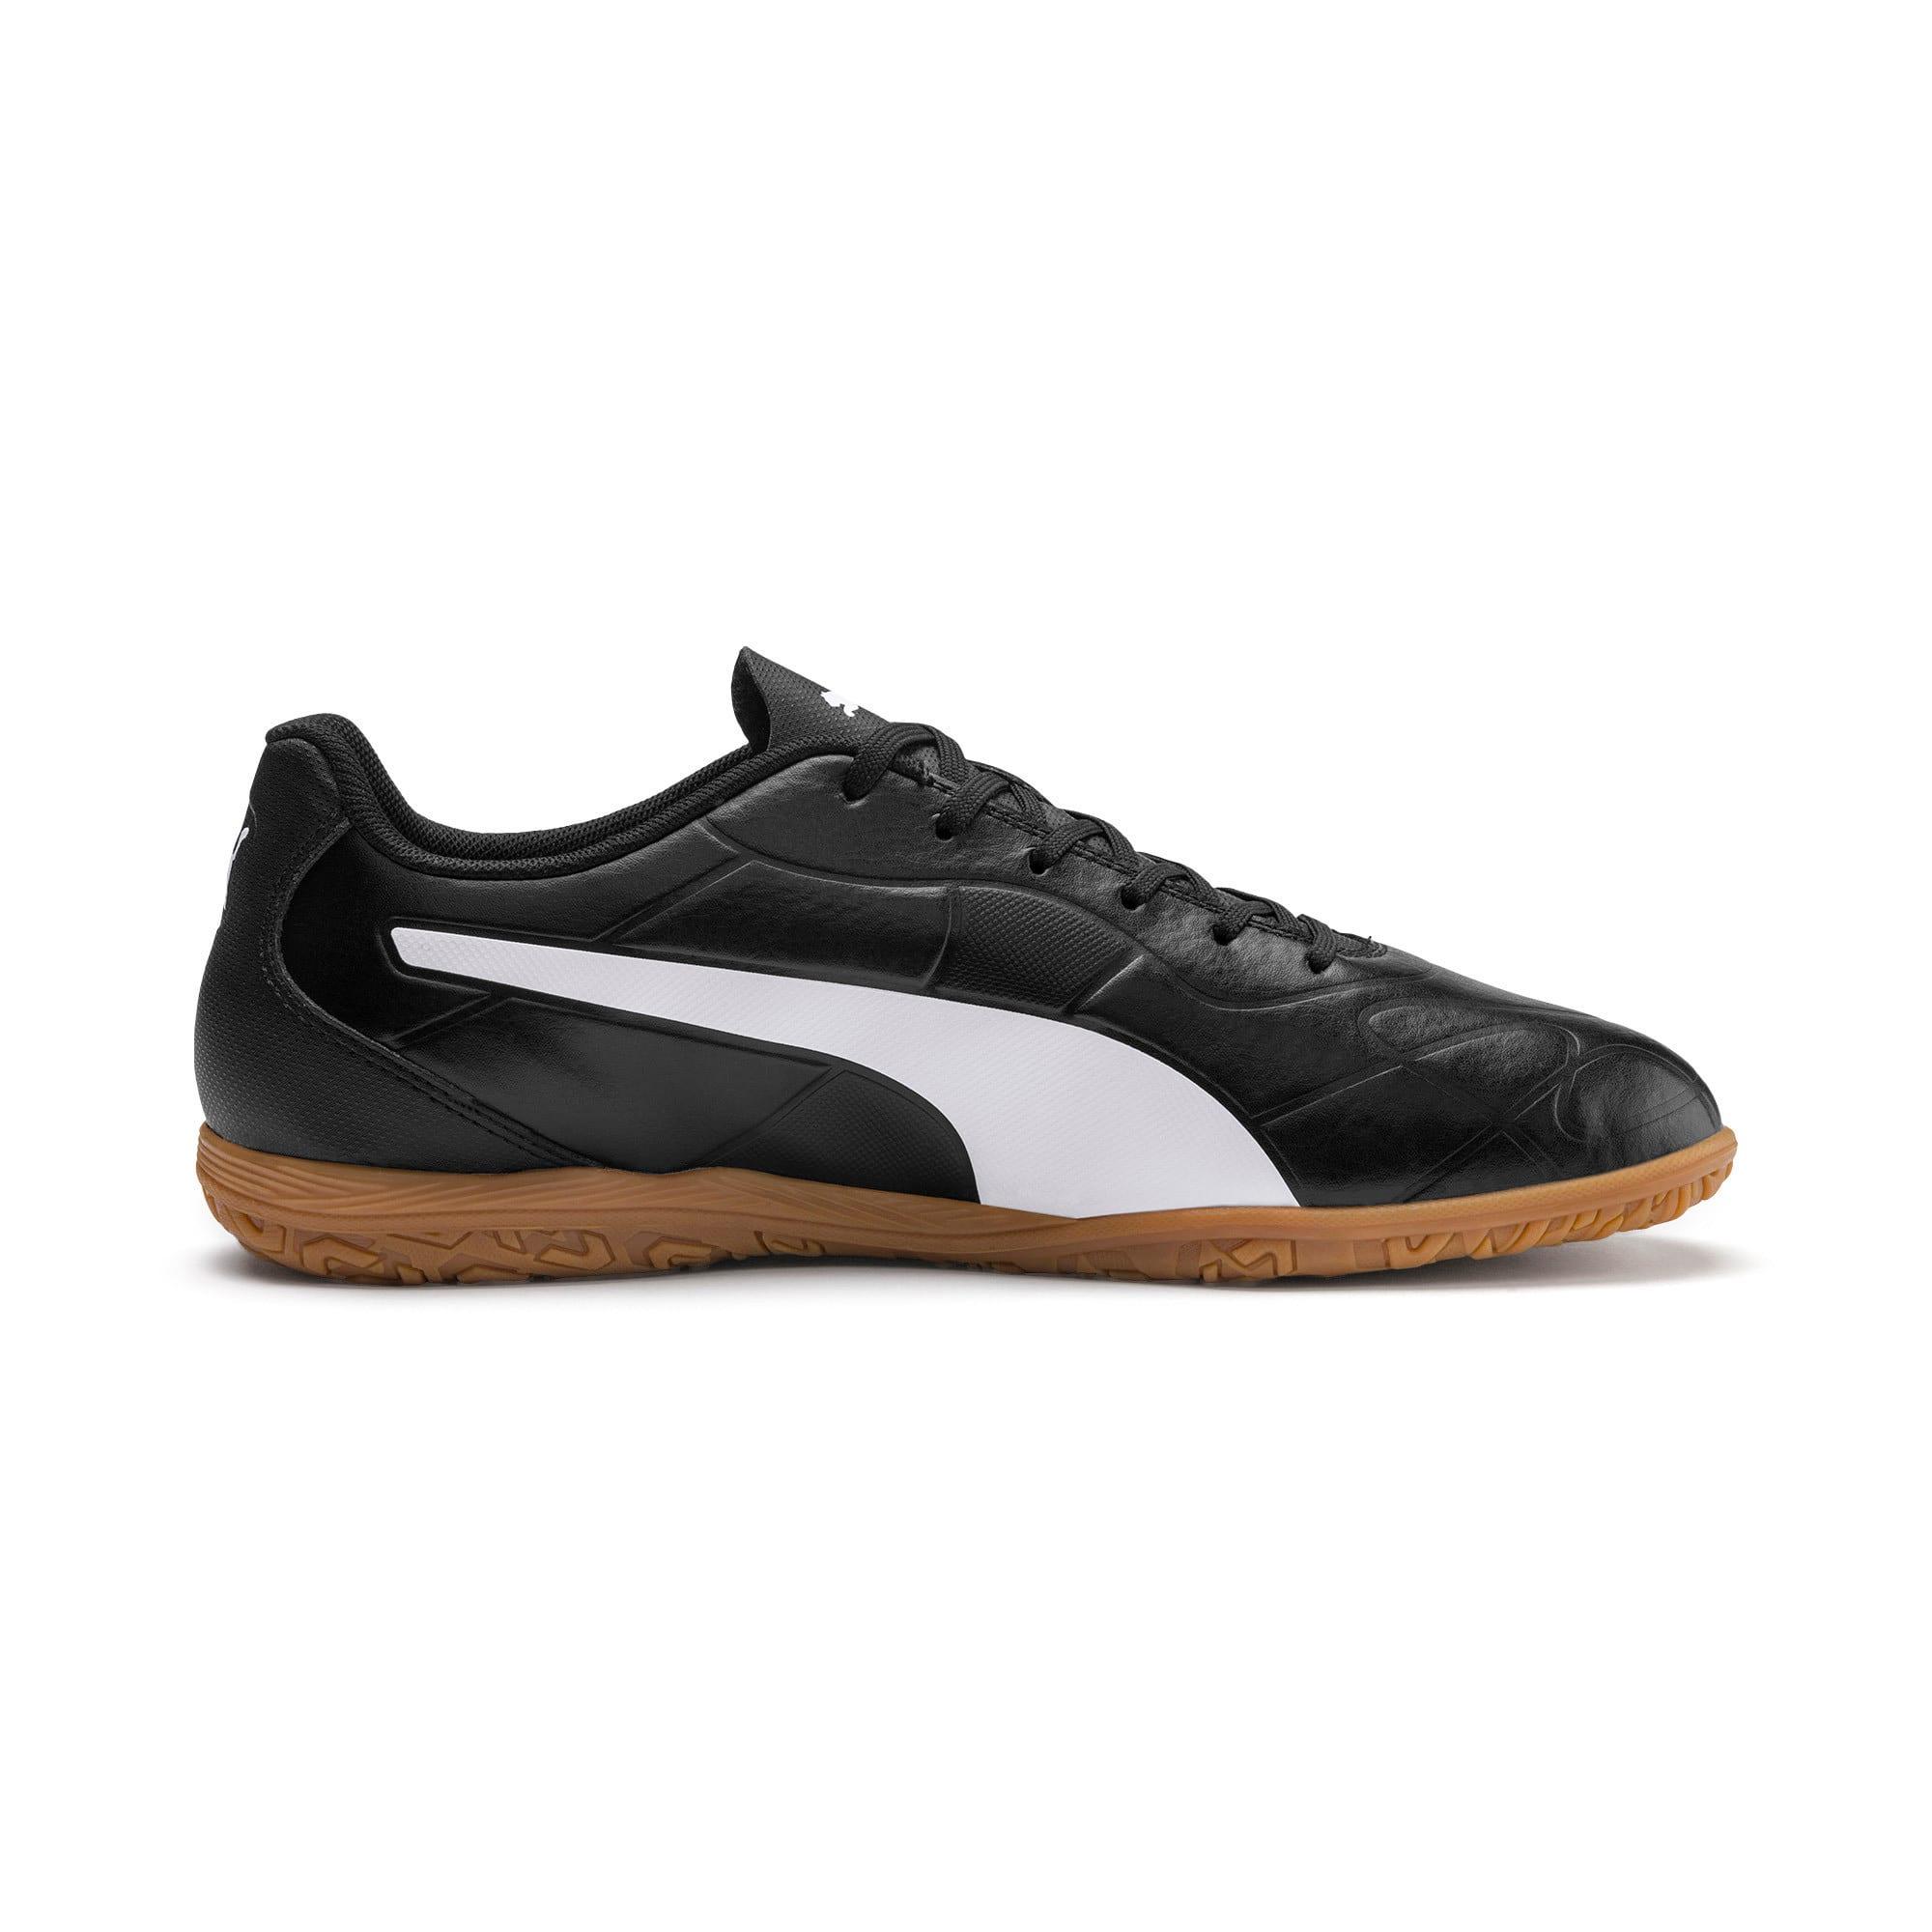 Thumbnail 7 of Monarch IT Men's Football Boots, Puma Black-Puma White, medium-IND